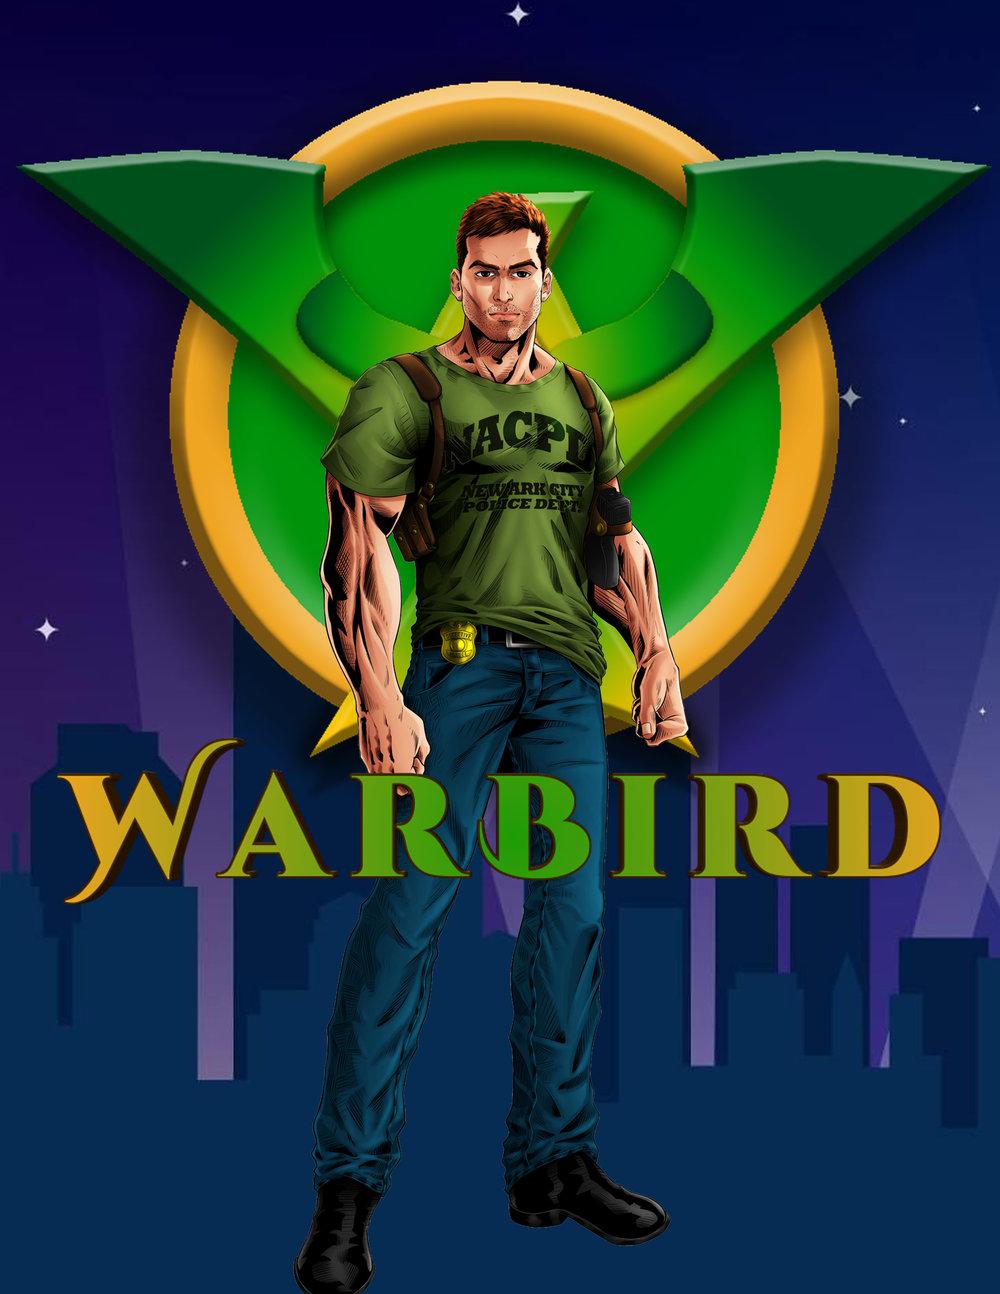 Dean WarBird